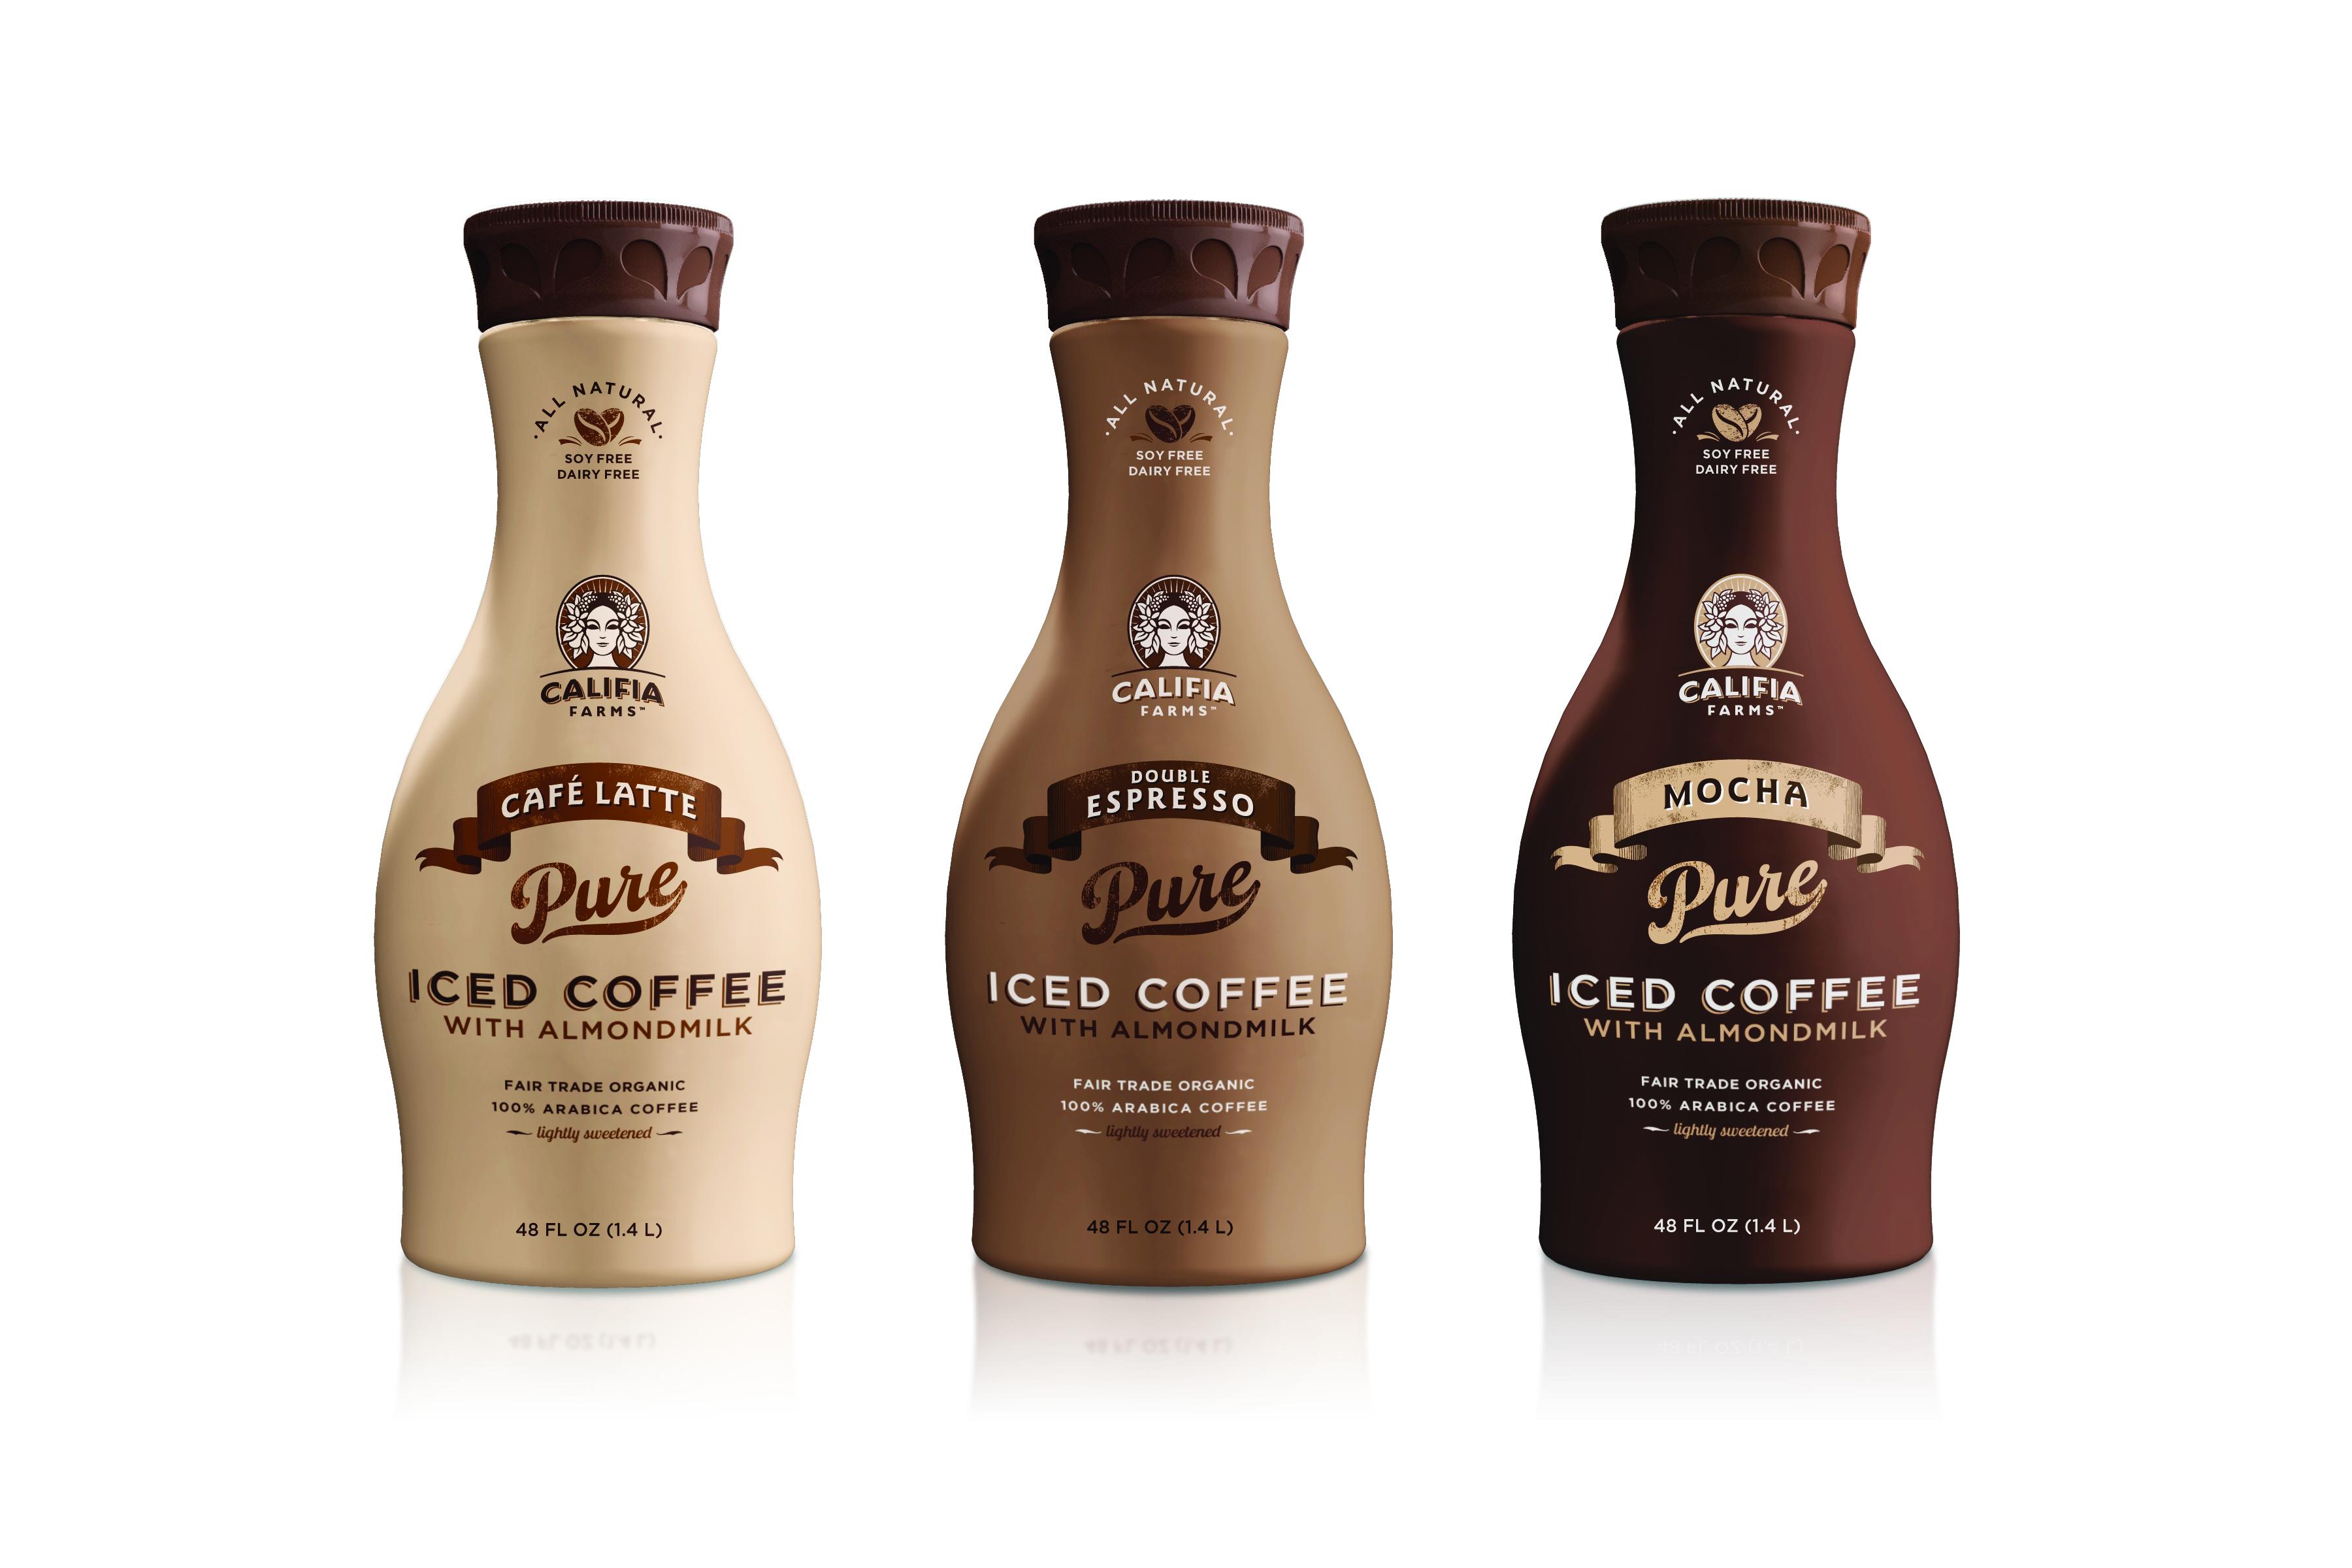 Califia Farms Iced Coffee with AlmondMilk